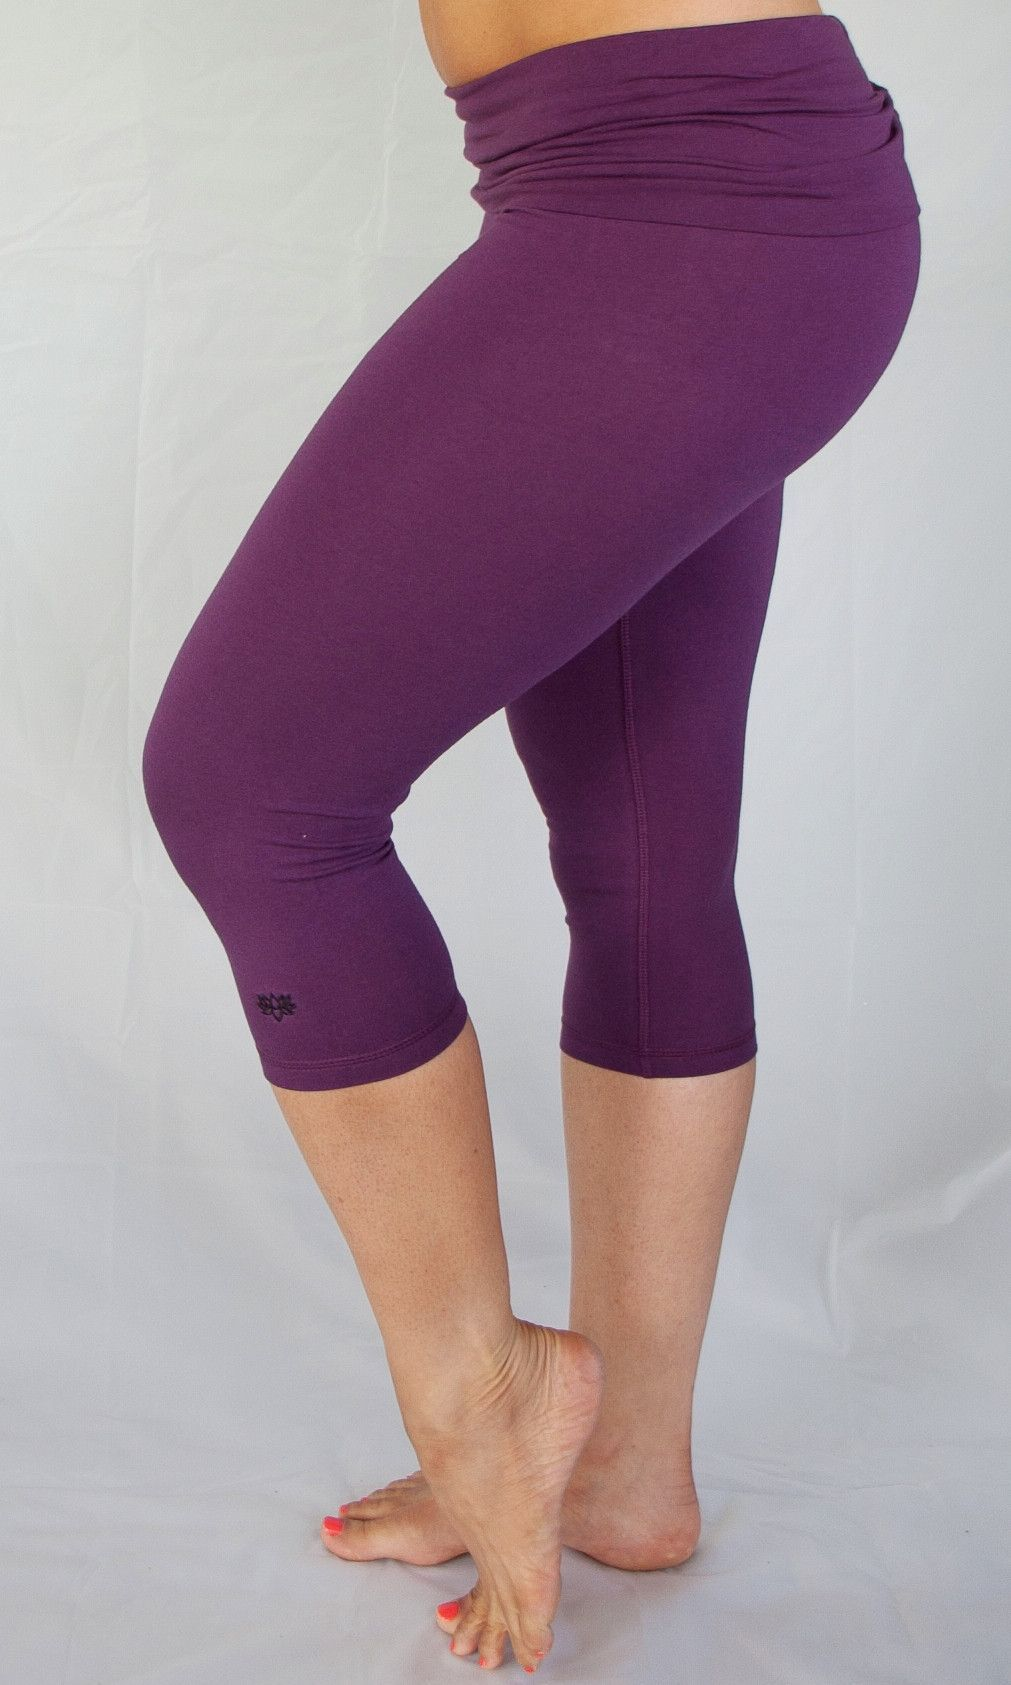 9378e4ab4d Plum 3/4 Length Yoga Pants | Products | Yoga Pants, Pants, Yoga